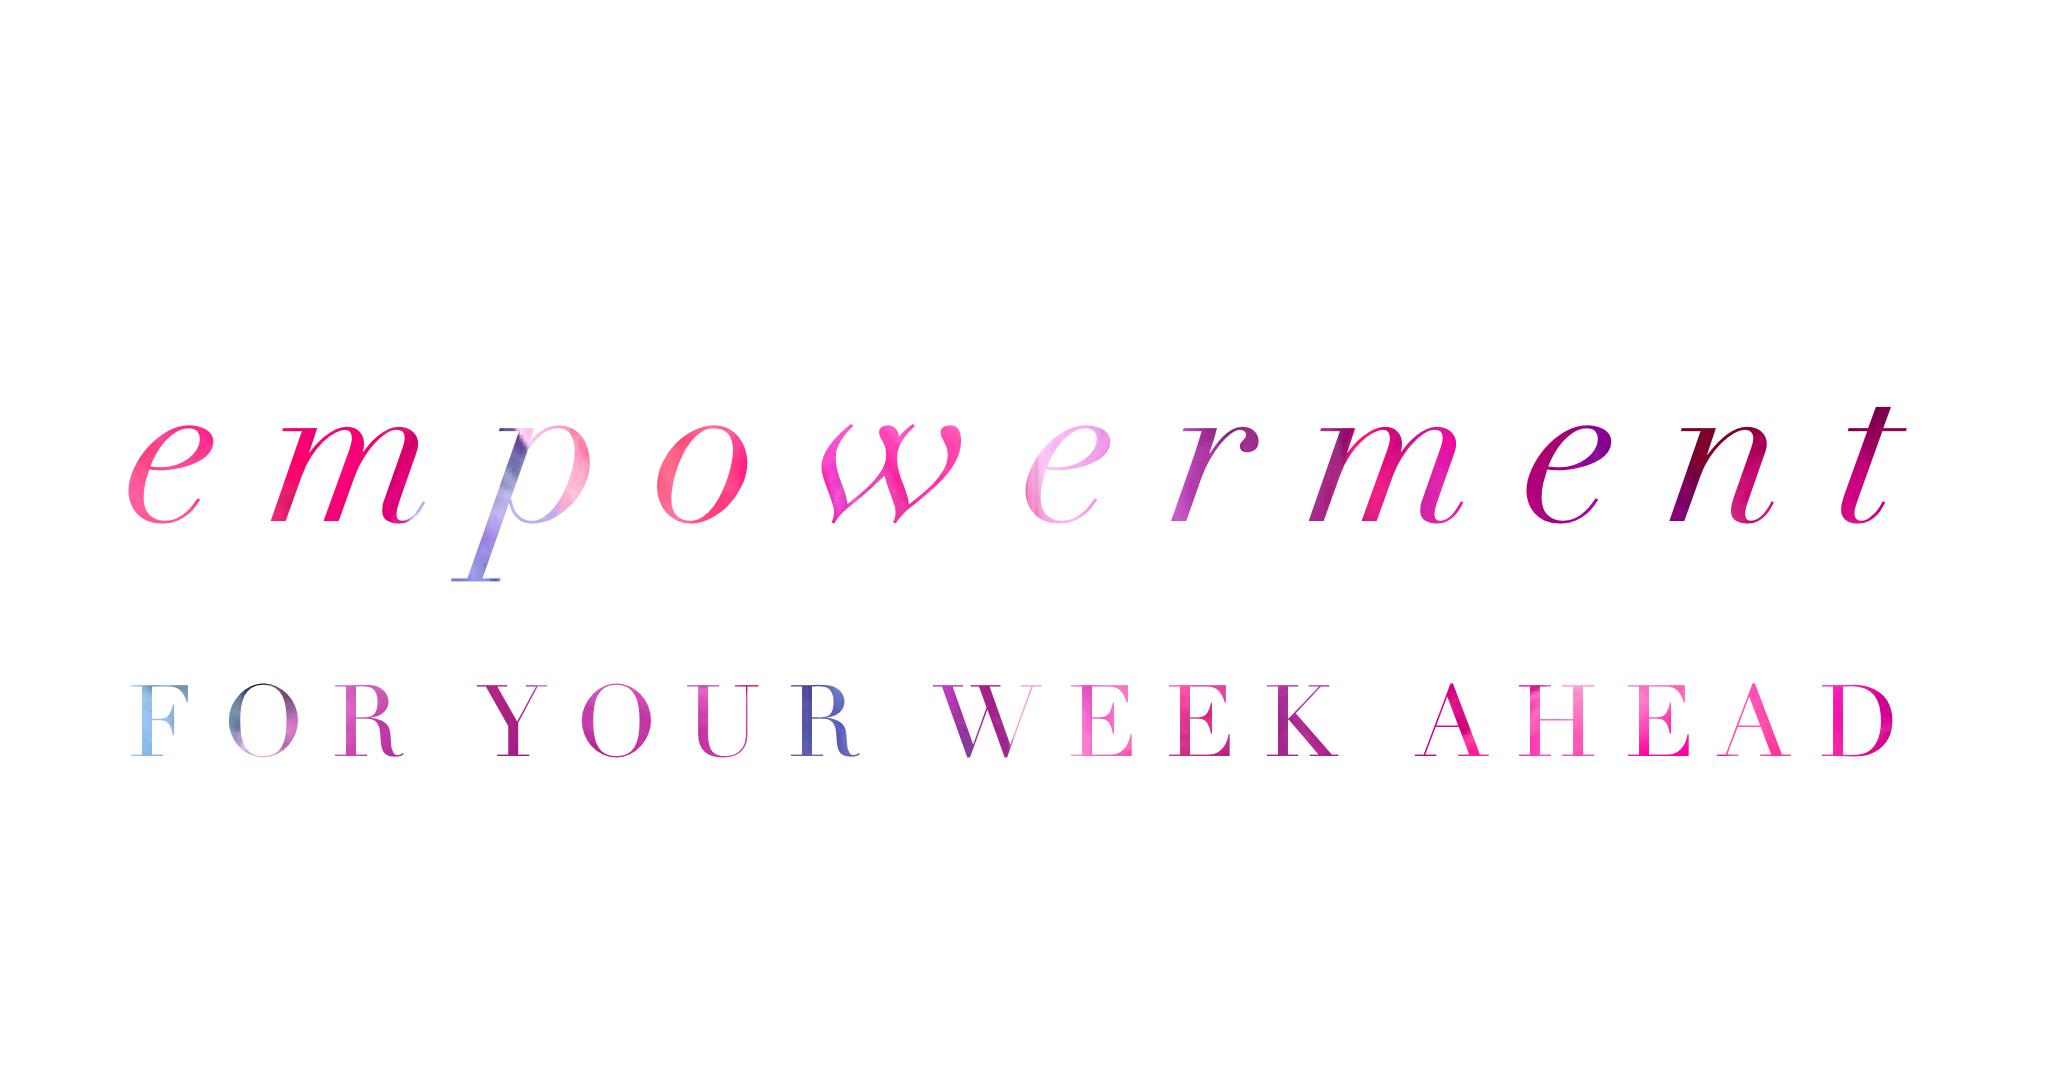 Empowering your week ahead